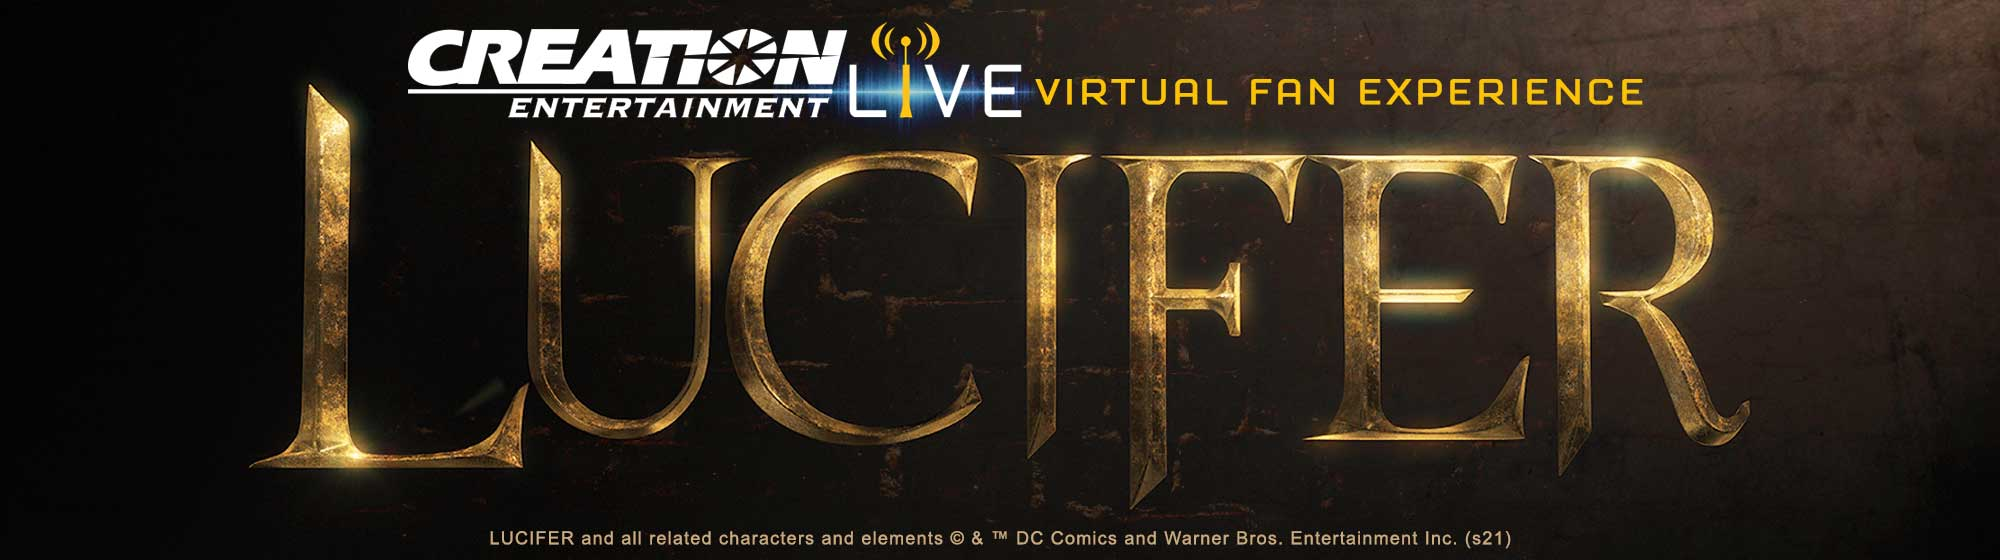 Creation Entertainment presents Virtual Fan Experiences